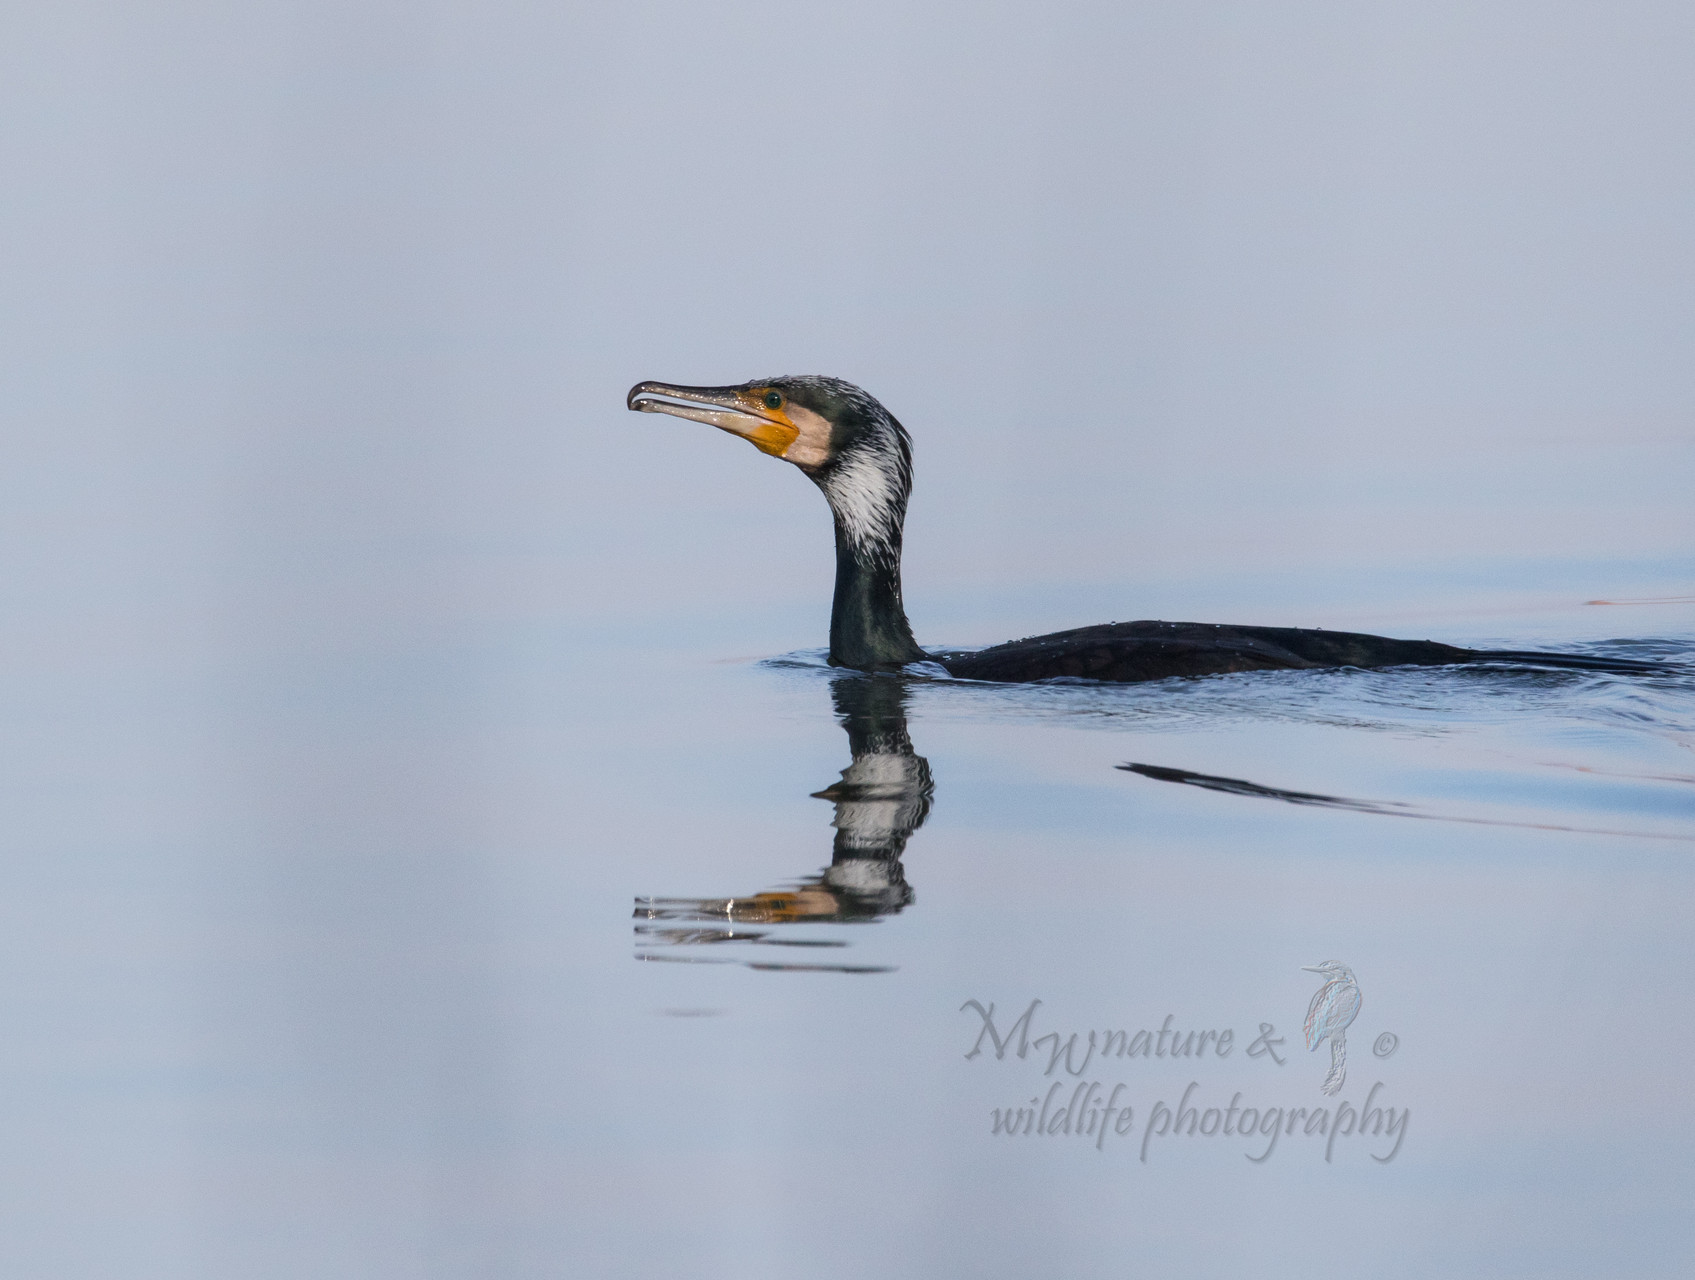 Kormoran / Cormorant (Phalacrocorax carbo)